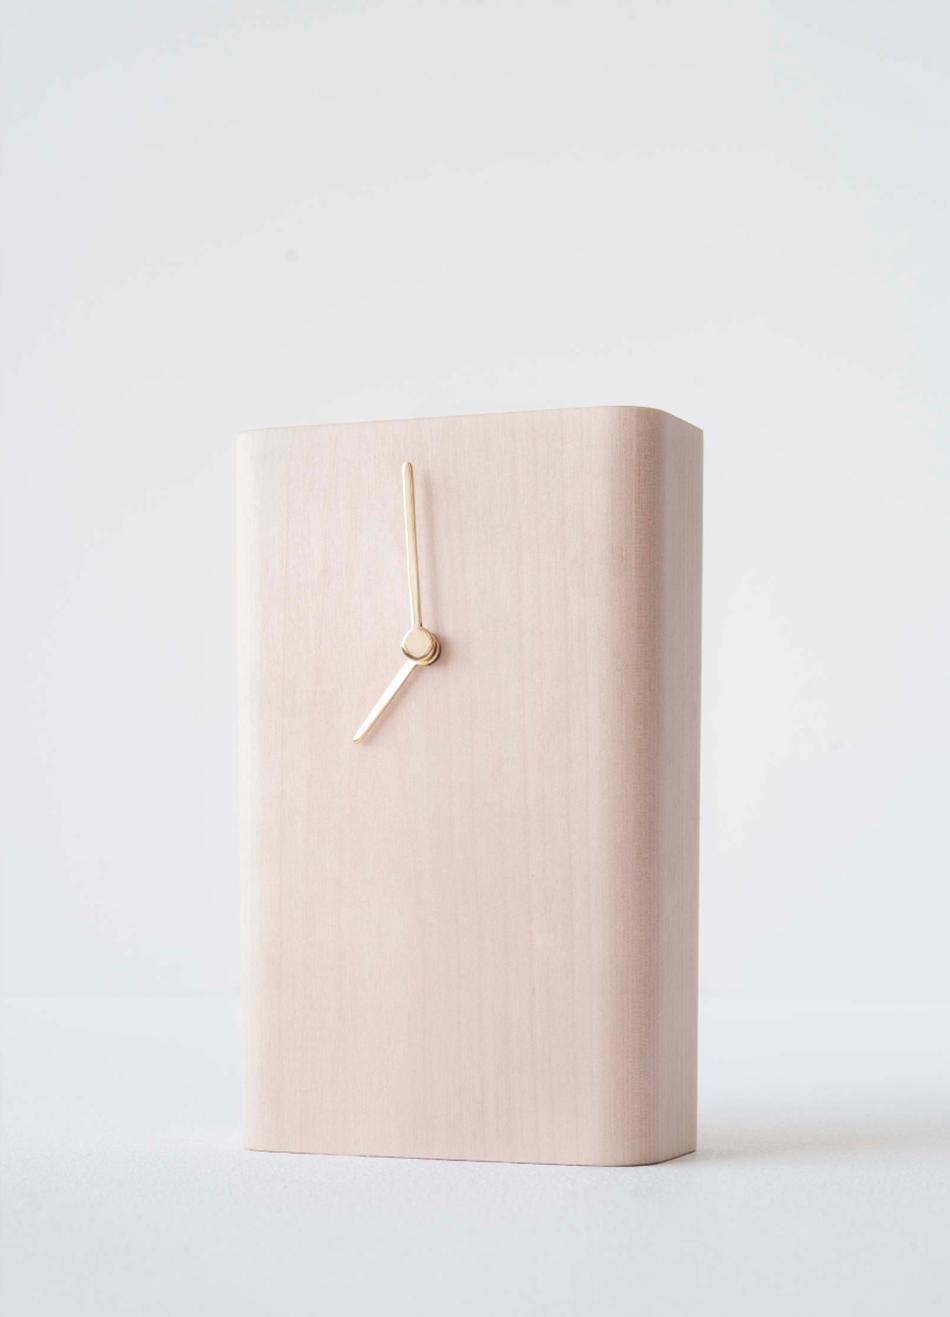 Plnty_klokke_Andreas Bergsaker_design_foto_Lasse_Floede